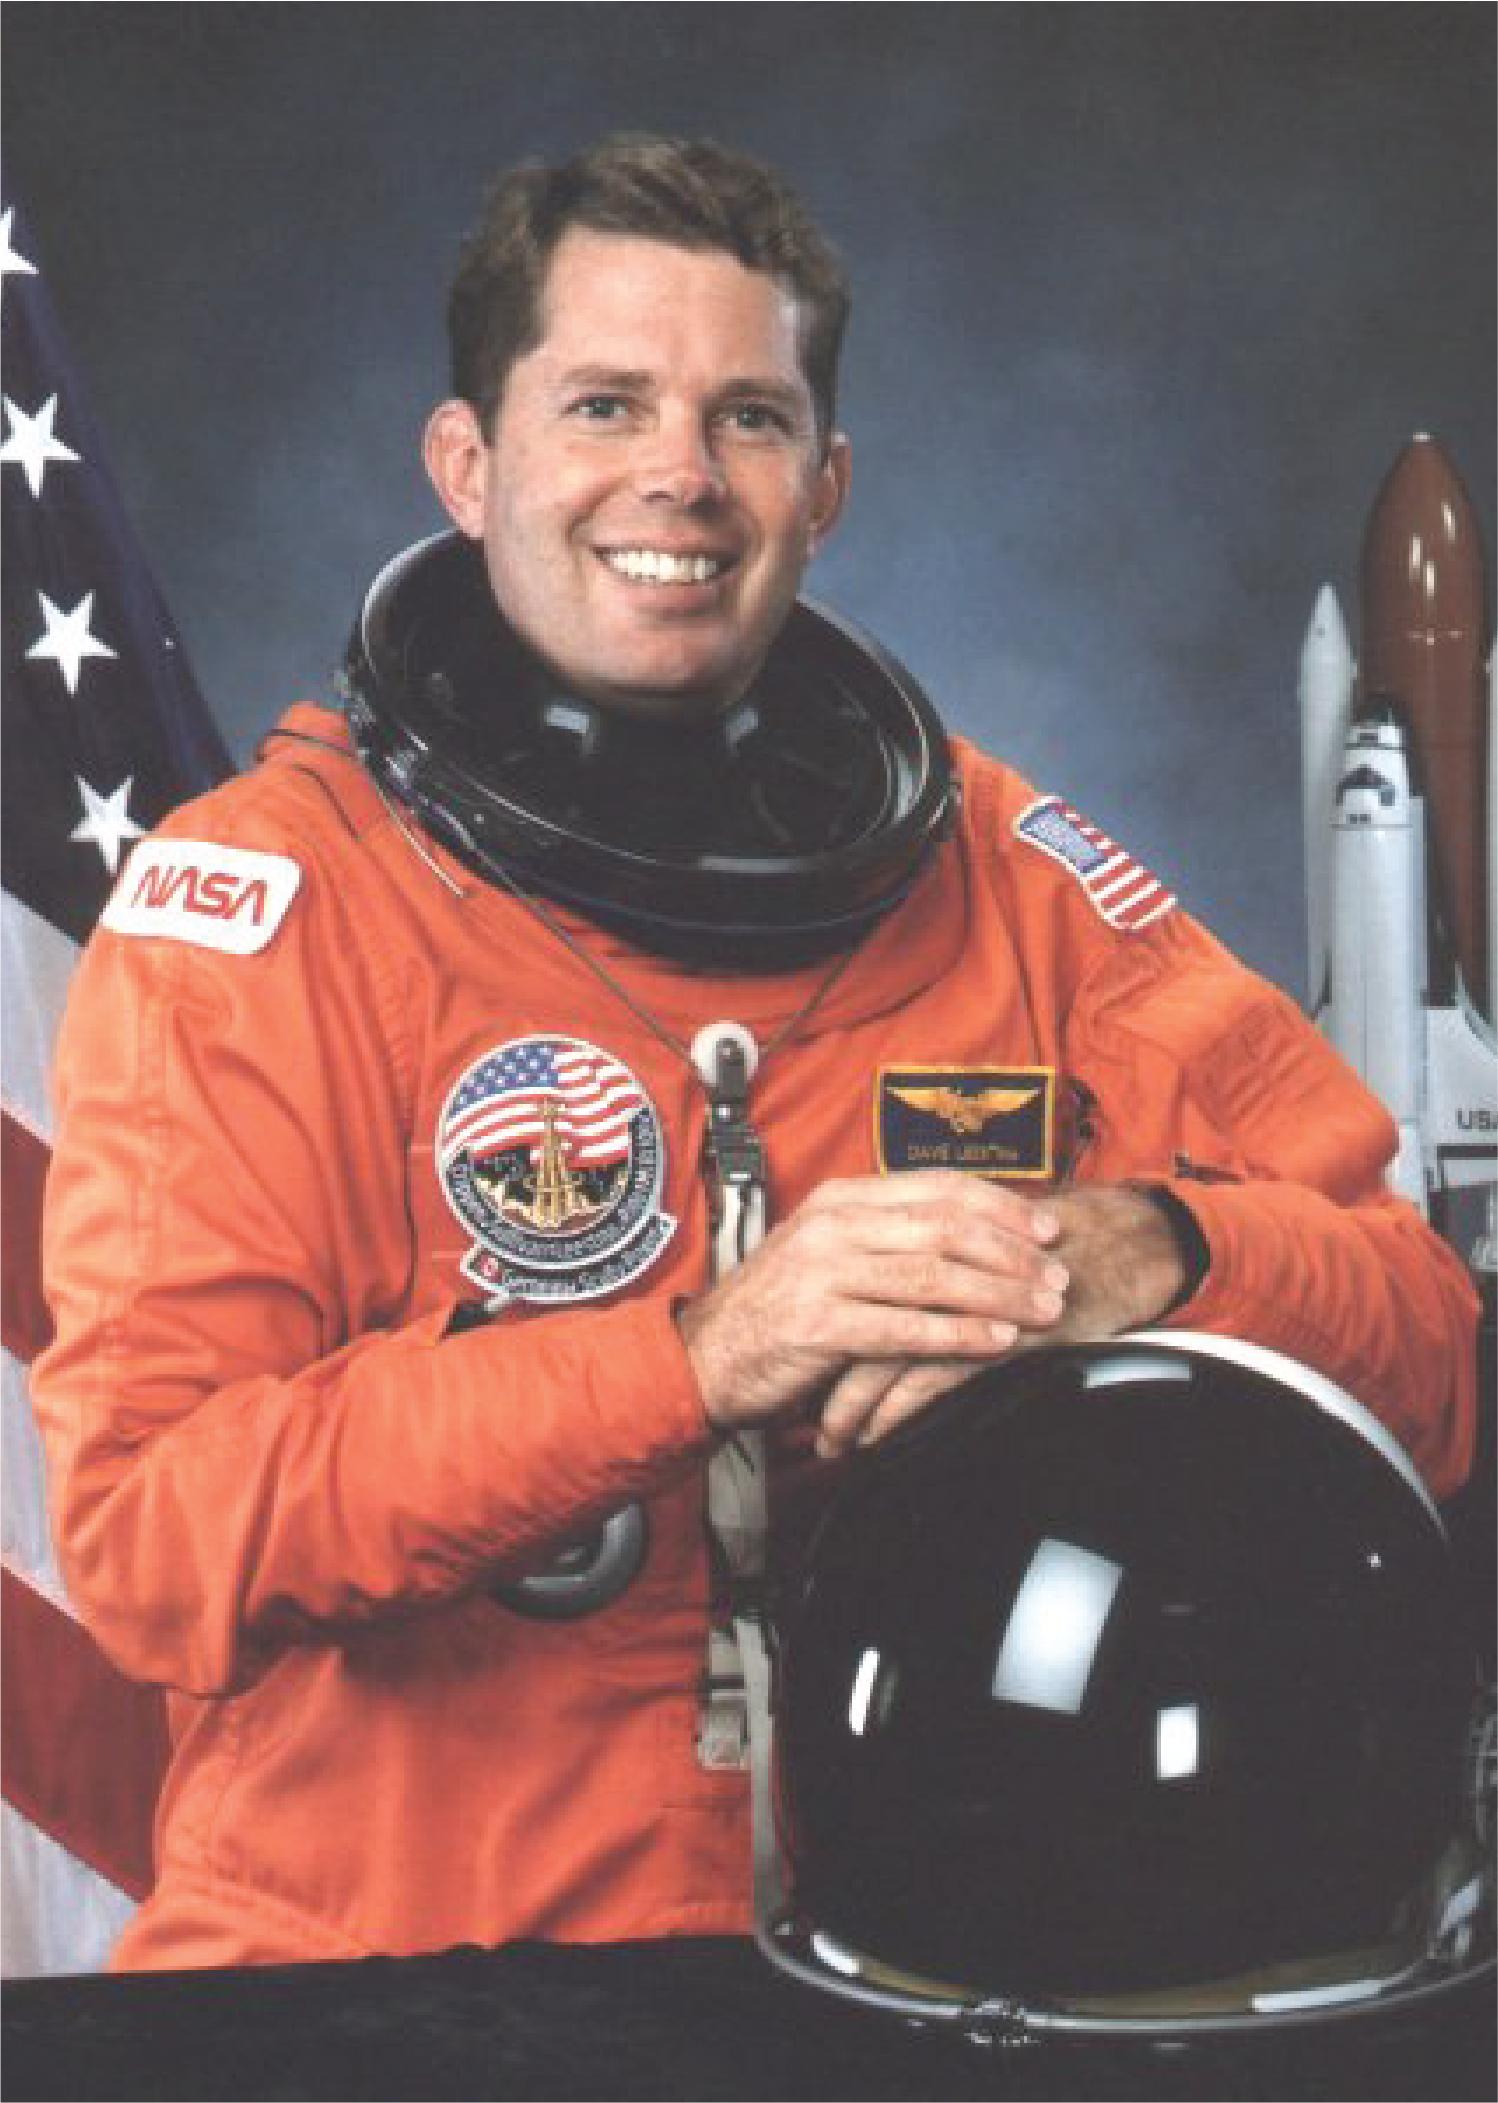 Astronaut David C. Leestma